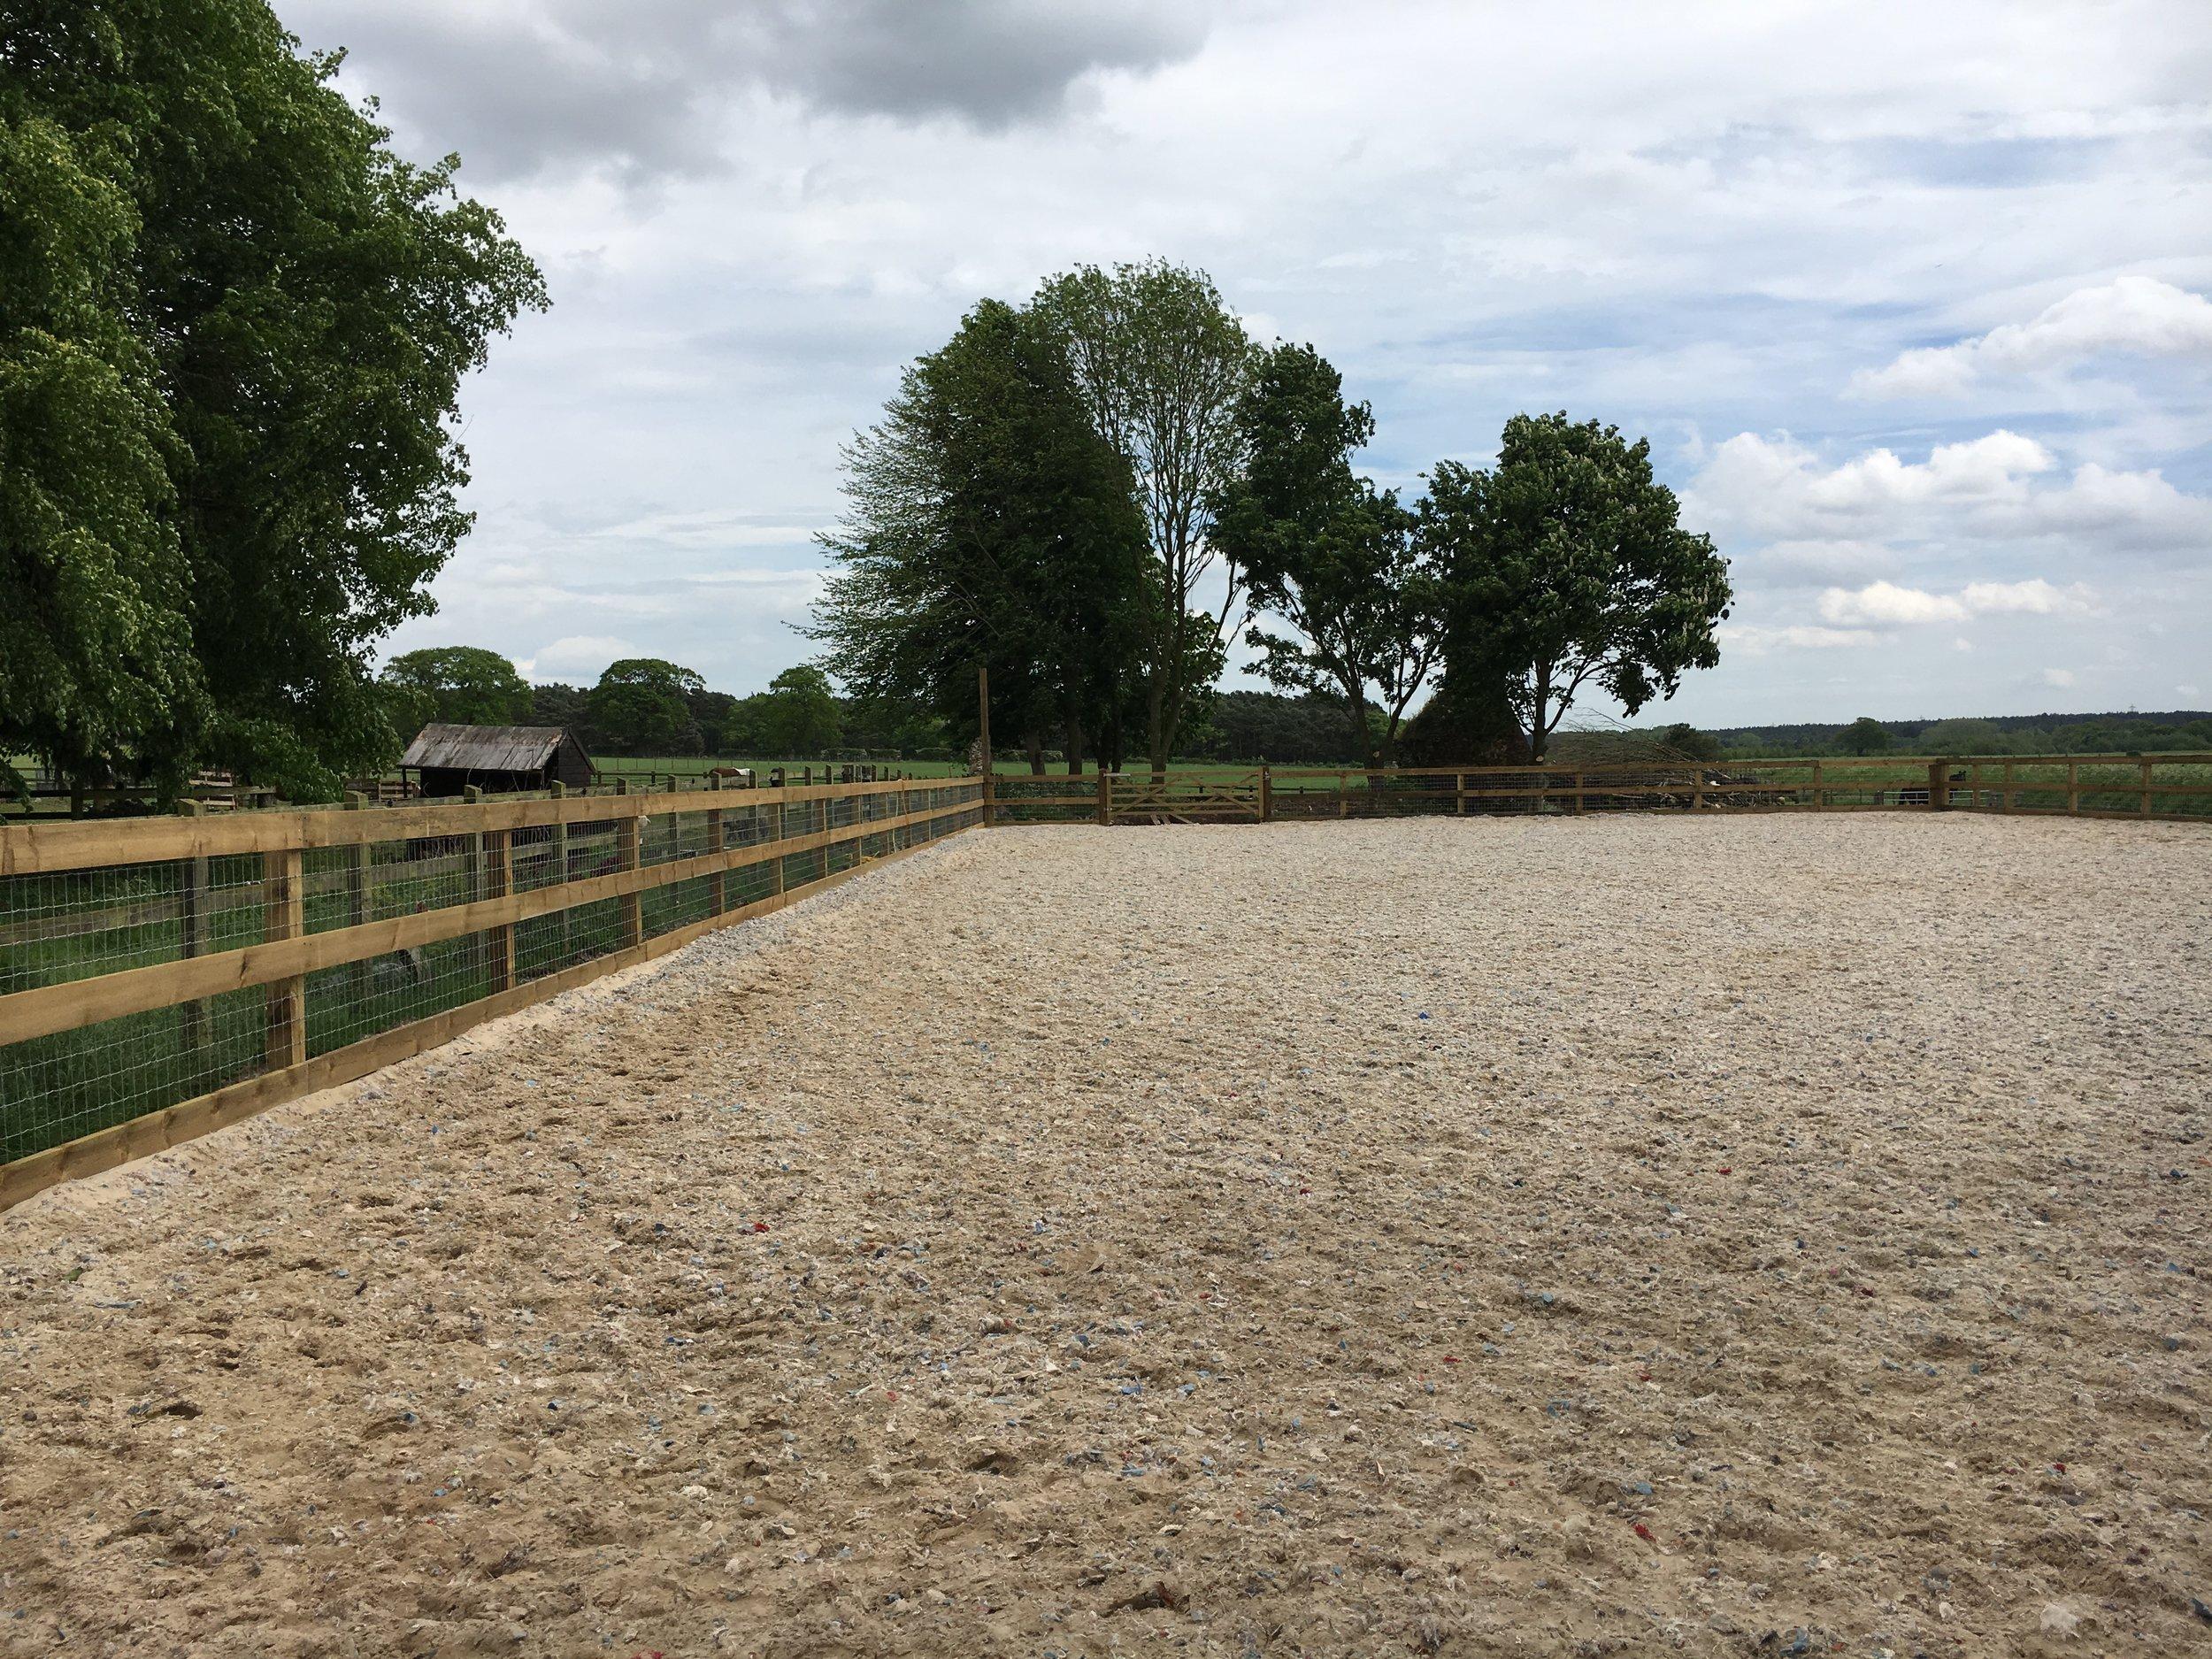 horse-arena-at-blackborough-end7.jpg